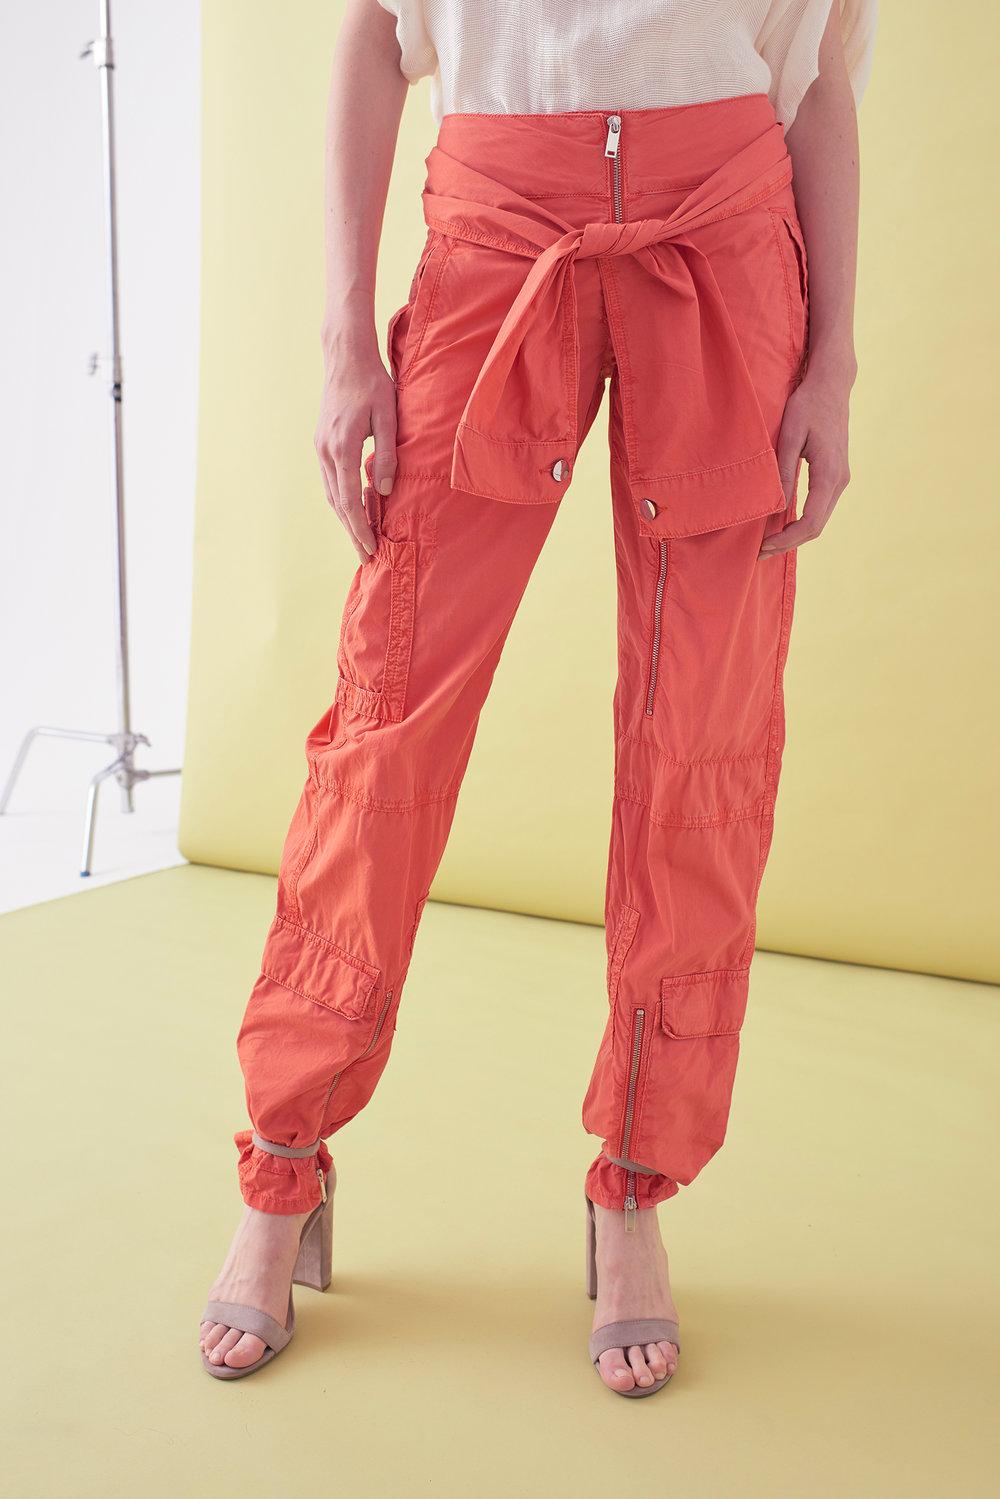 Sarah_Swann_SS17_14_Garment_Dyed_Rayon_Cotton_Utility_Trouser_Coral_F.jpg